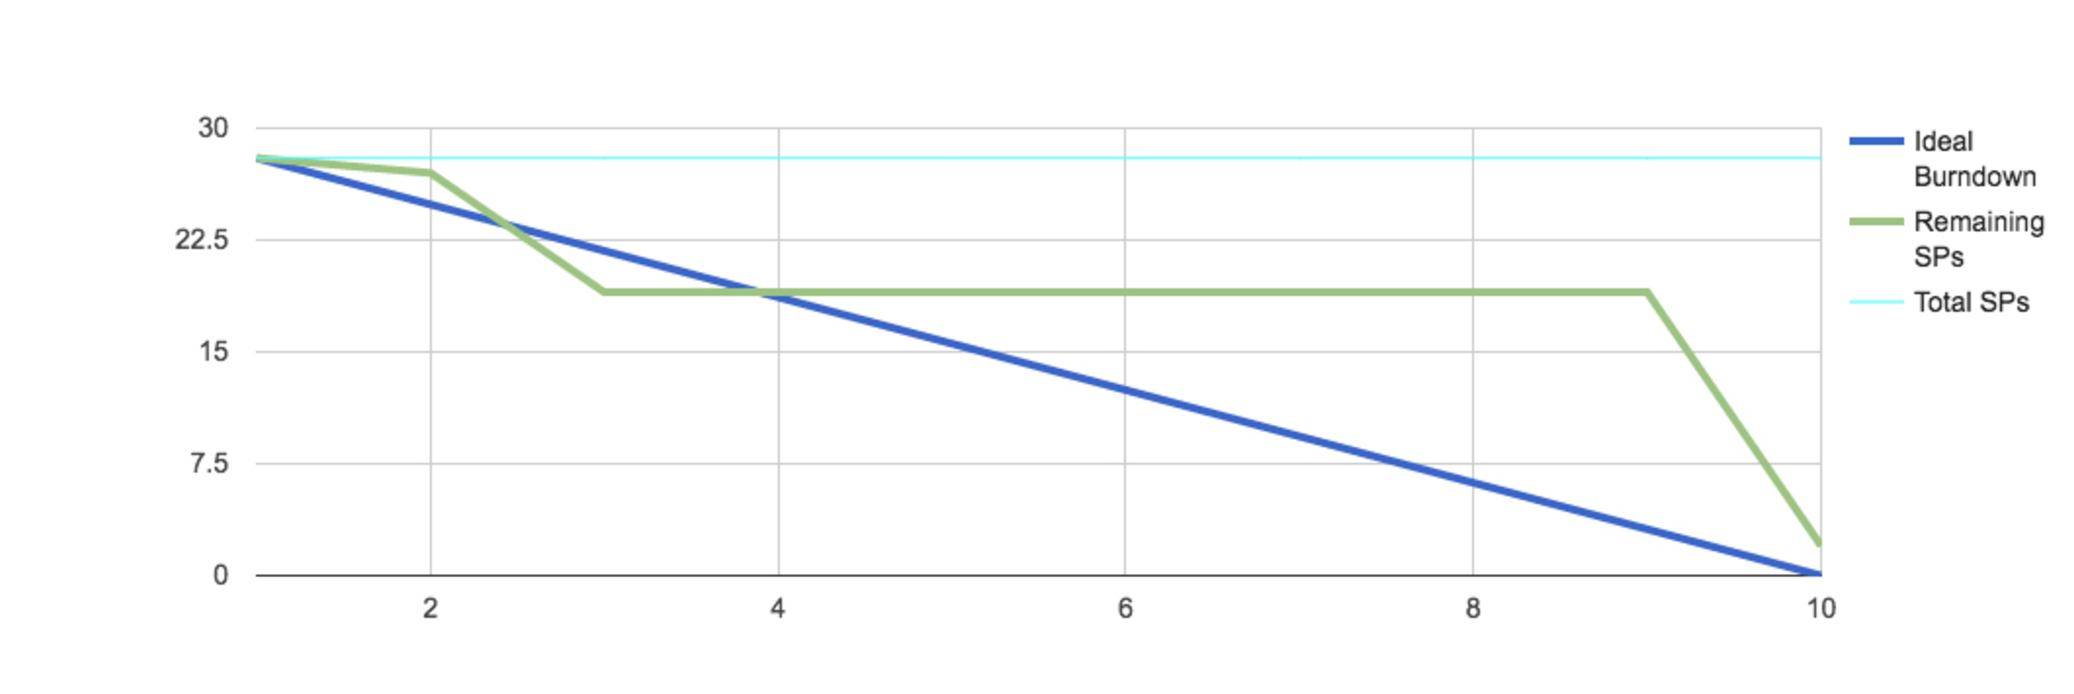 Flat burndown chart